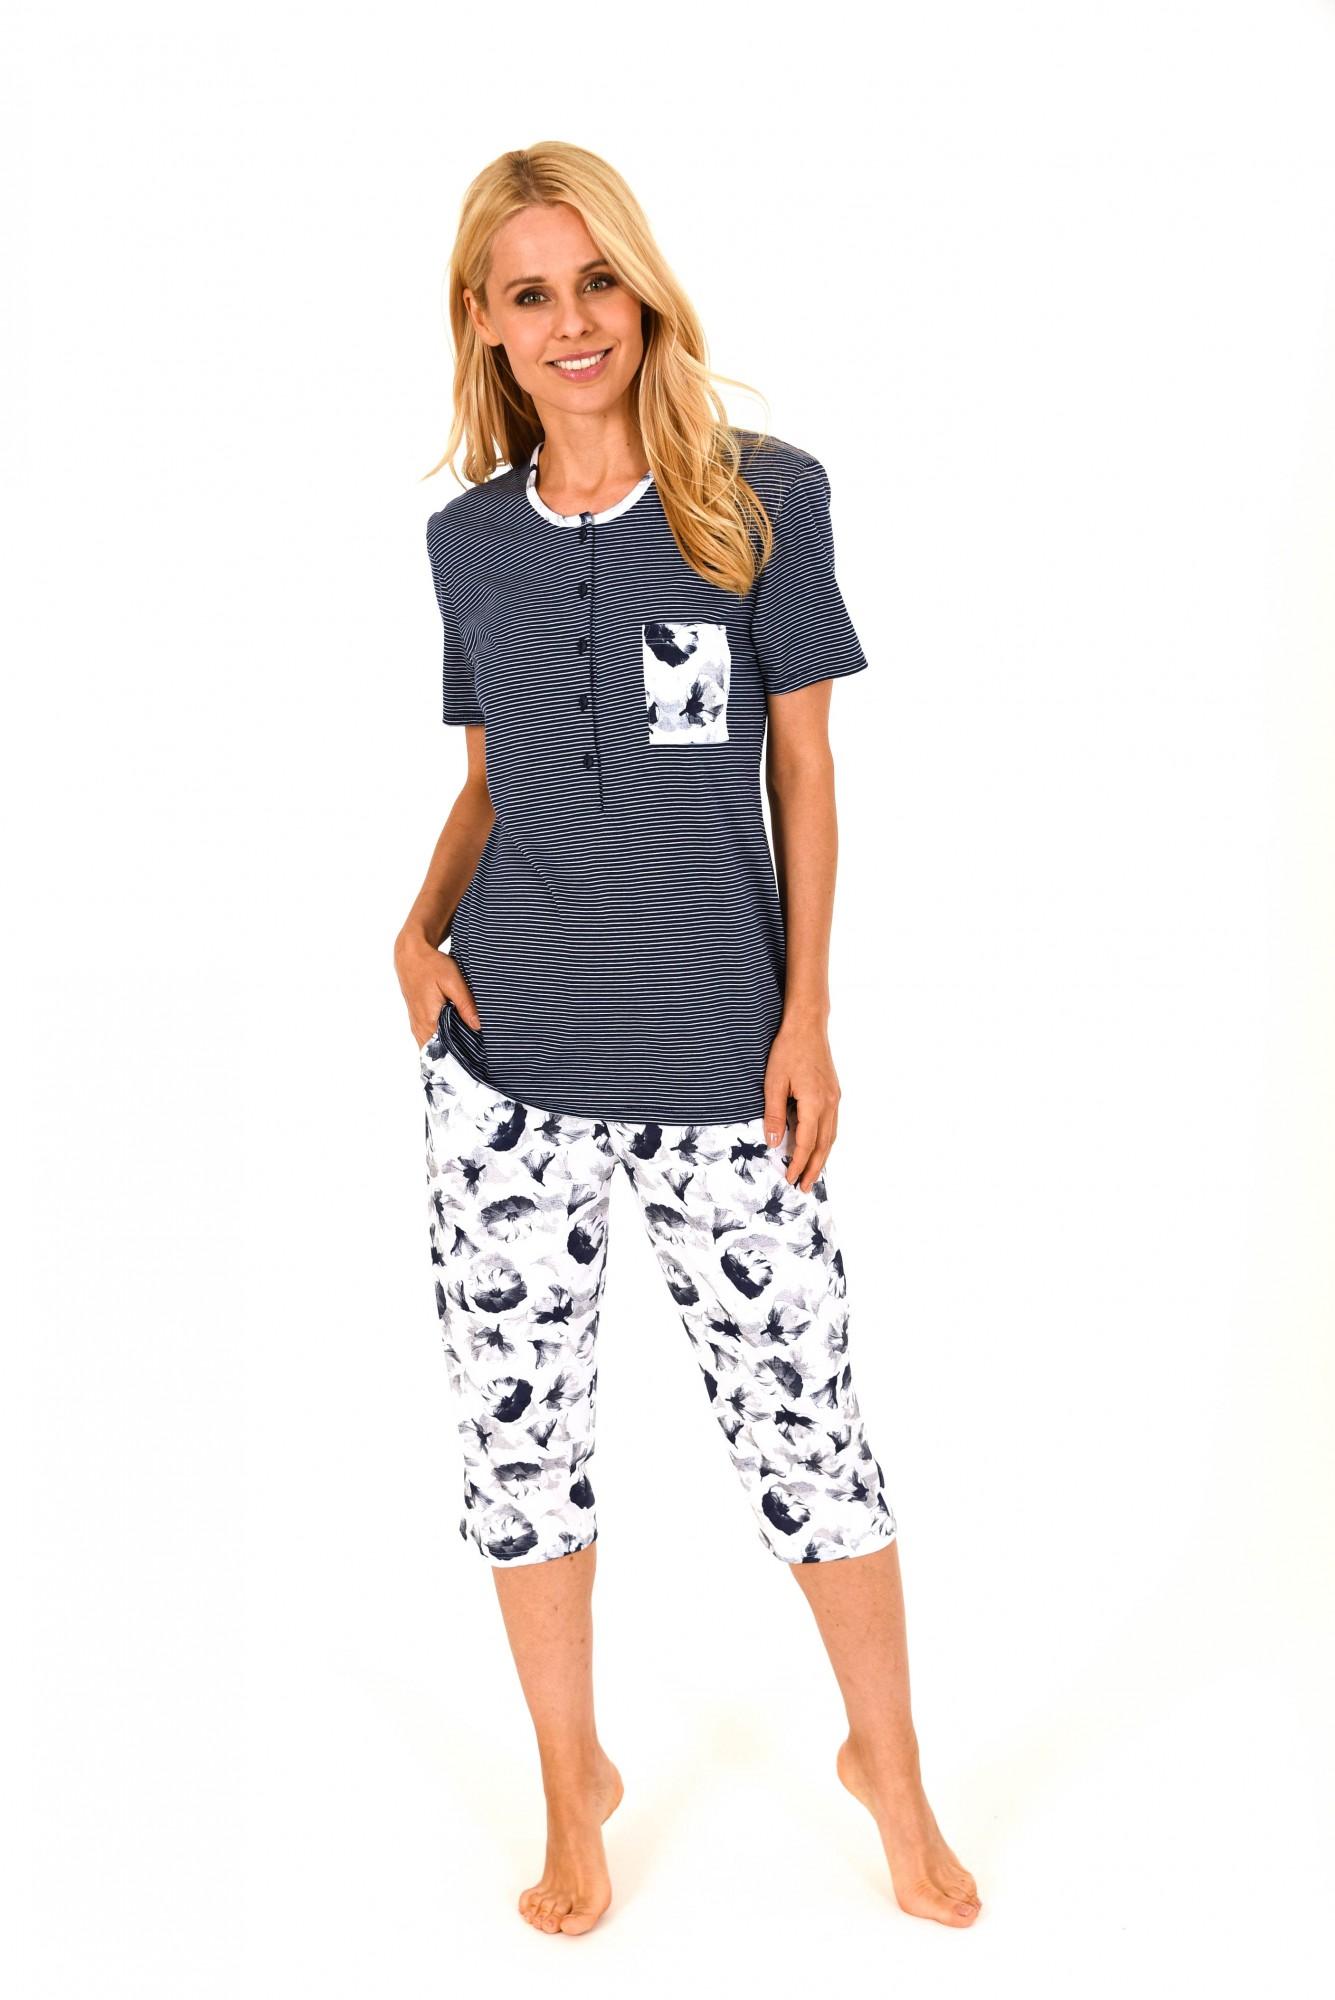 Damen Capri Pyjama kurzarm – tolle Optik – 171 204 90 881 001